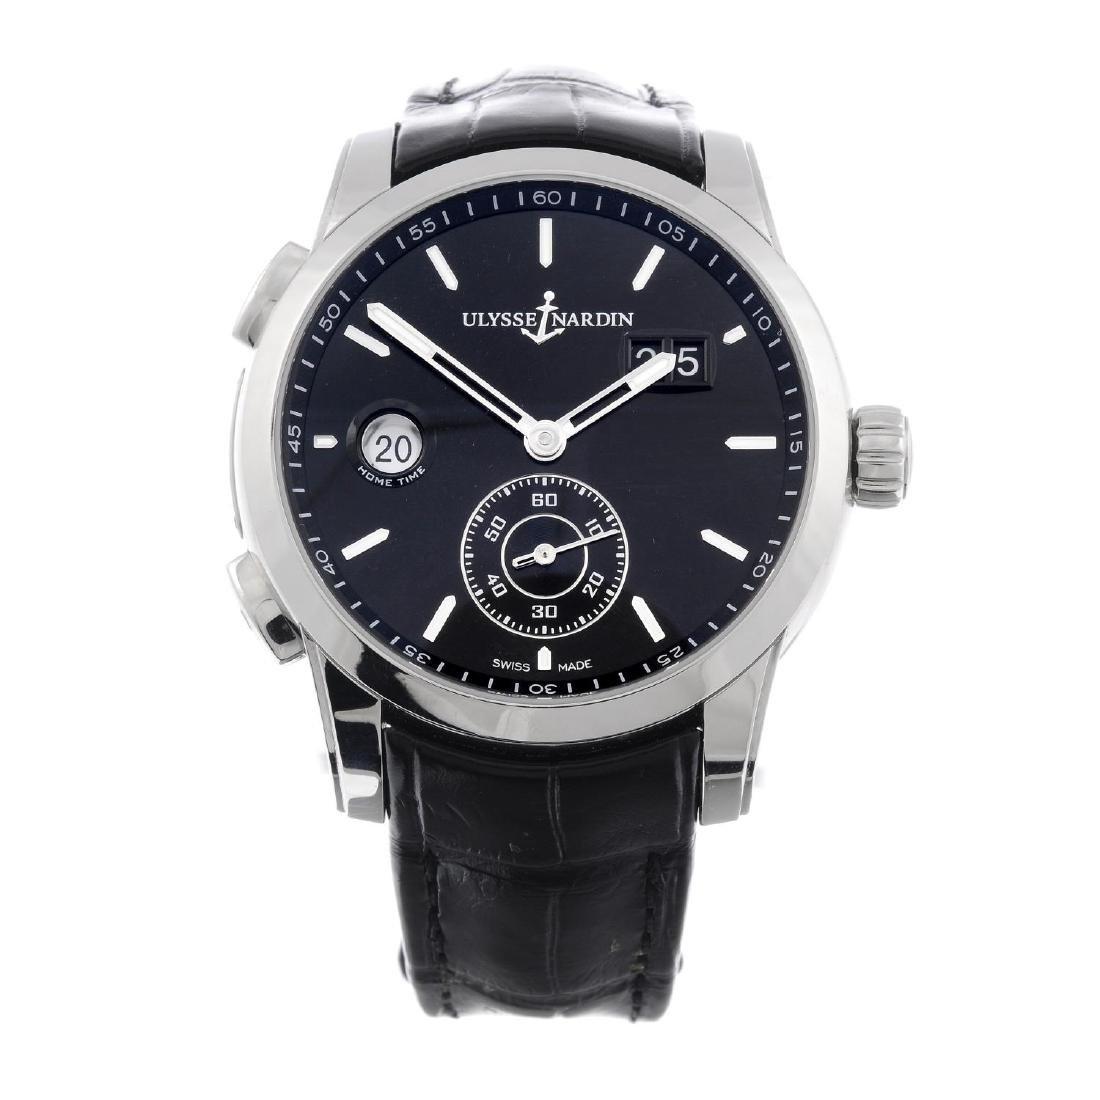 ULYSSE NARDIN - a gentleman's Dual Time wrist watch.